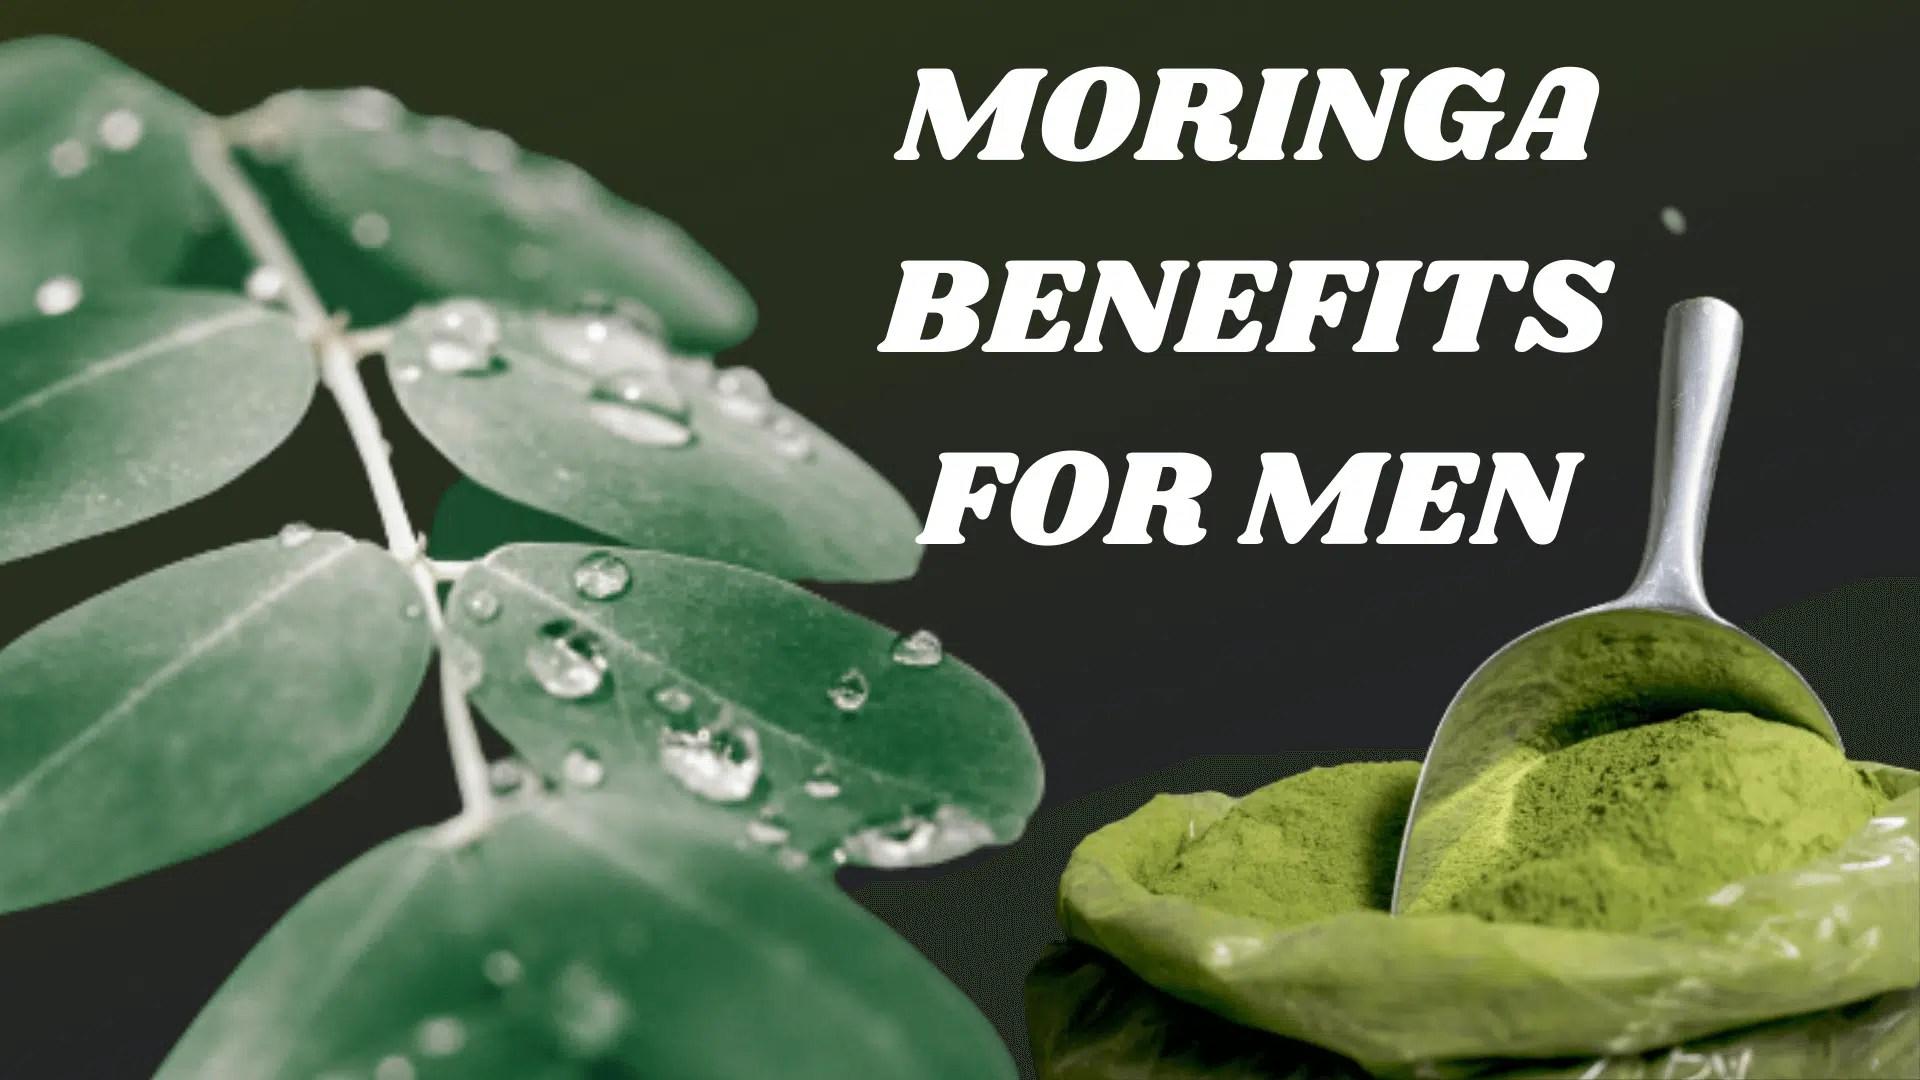 moringa benefits for men